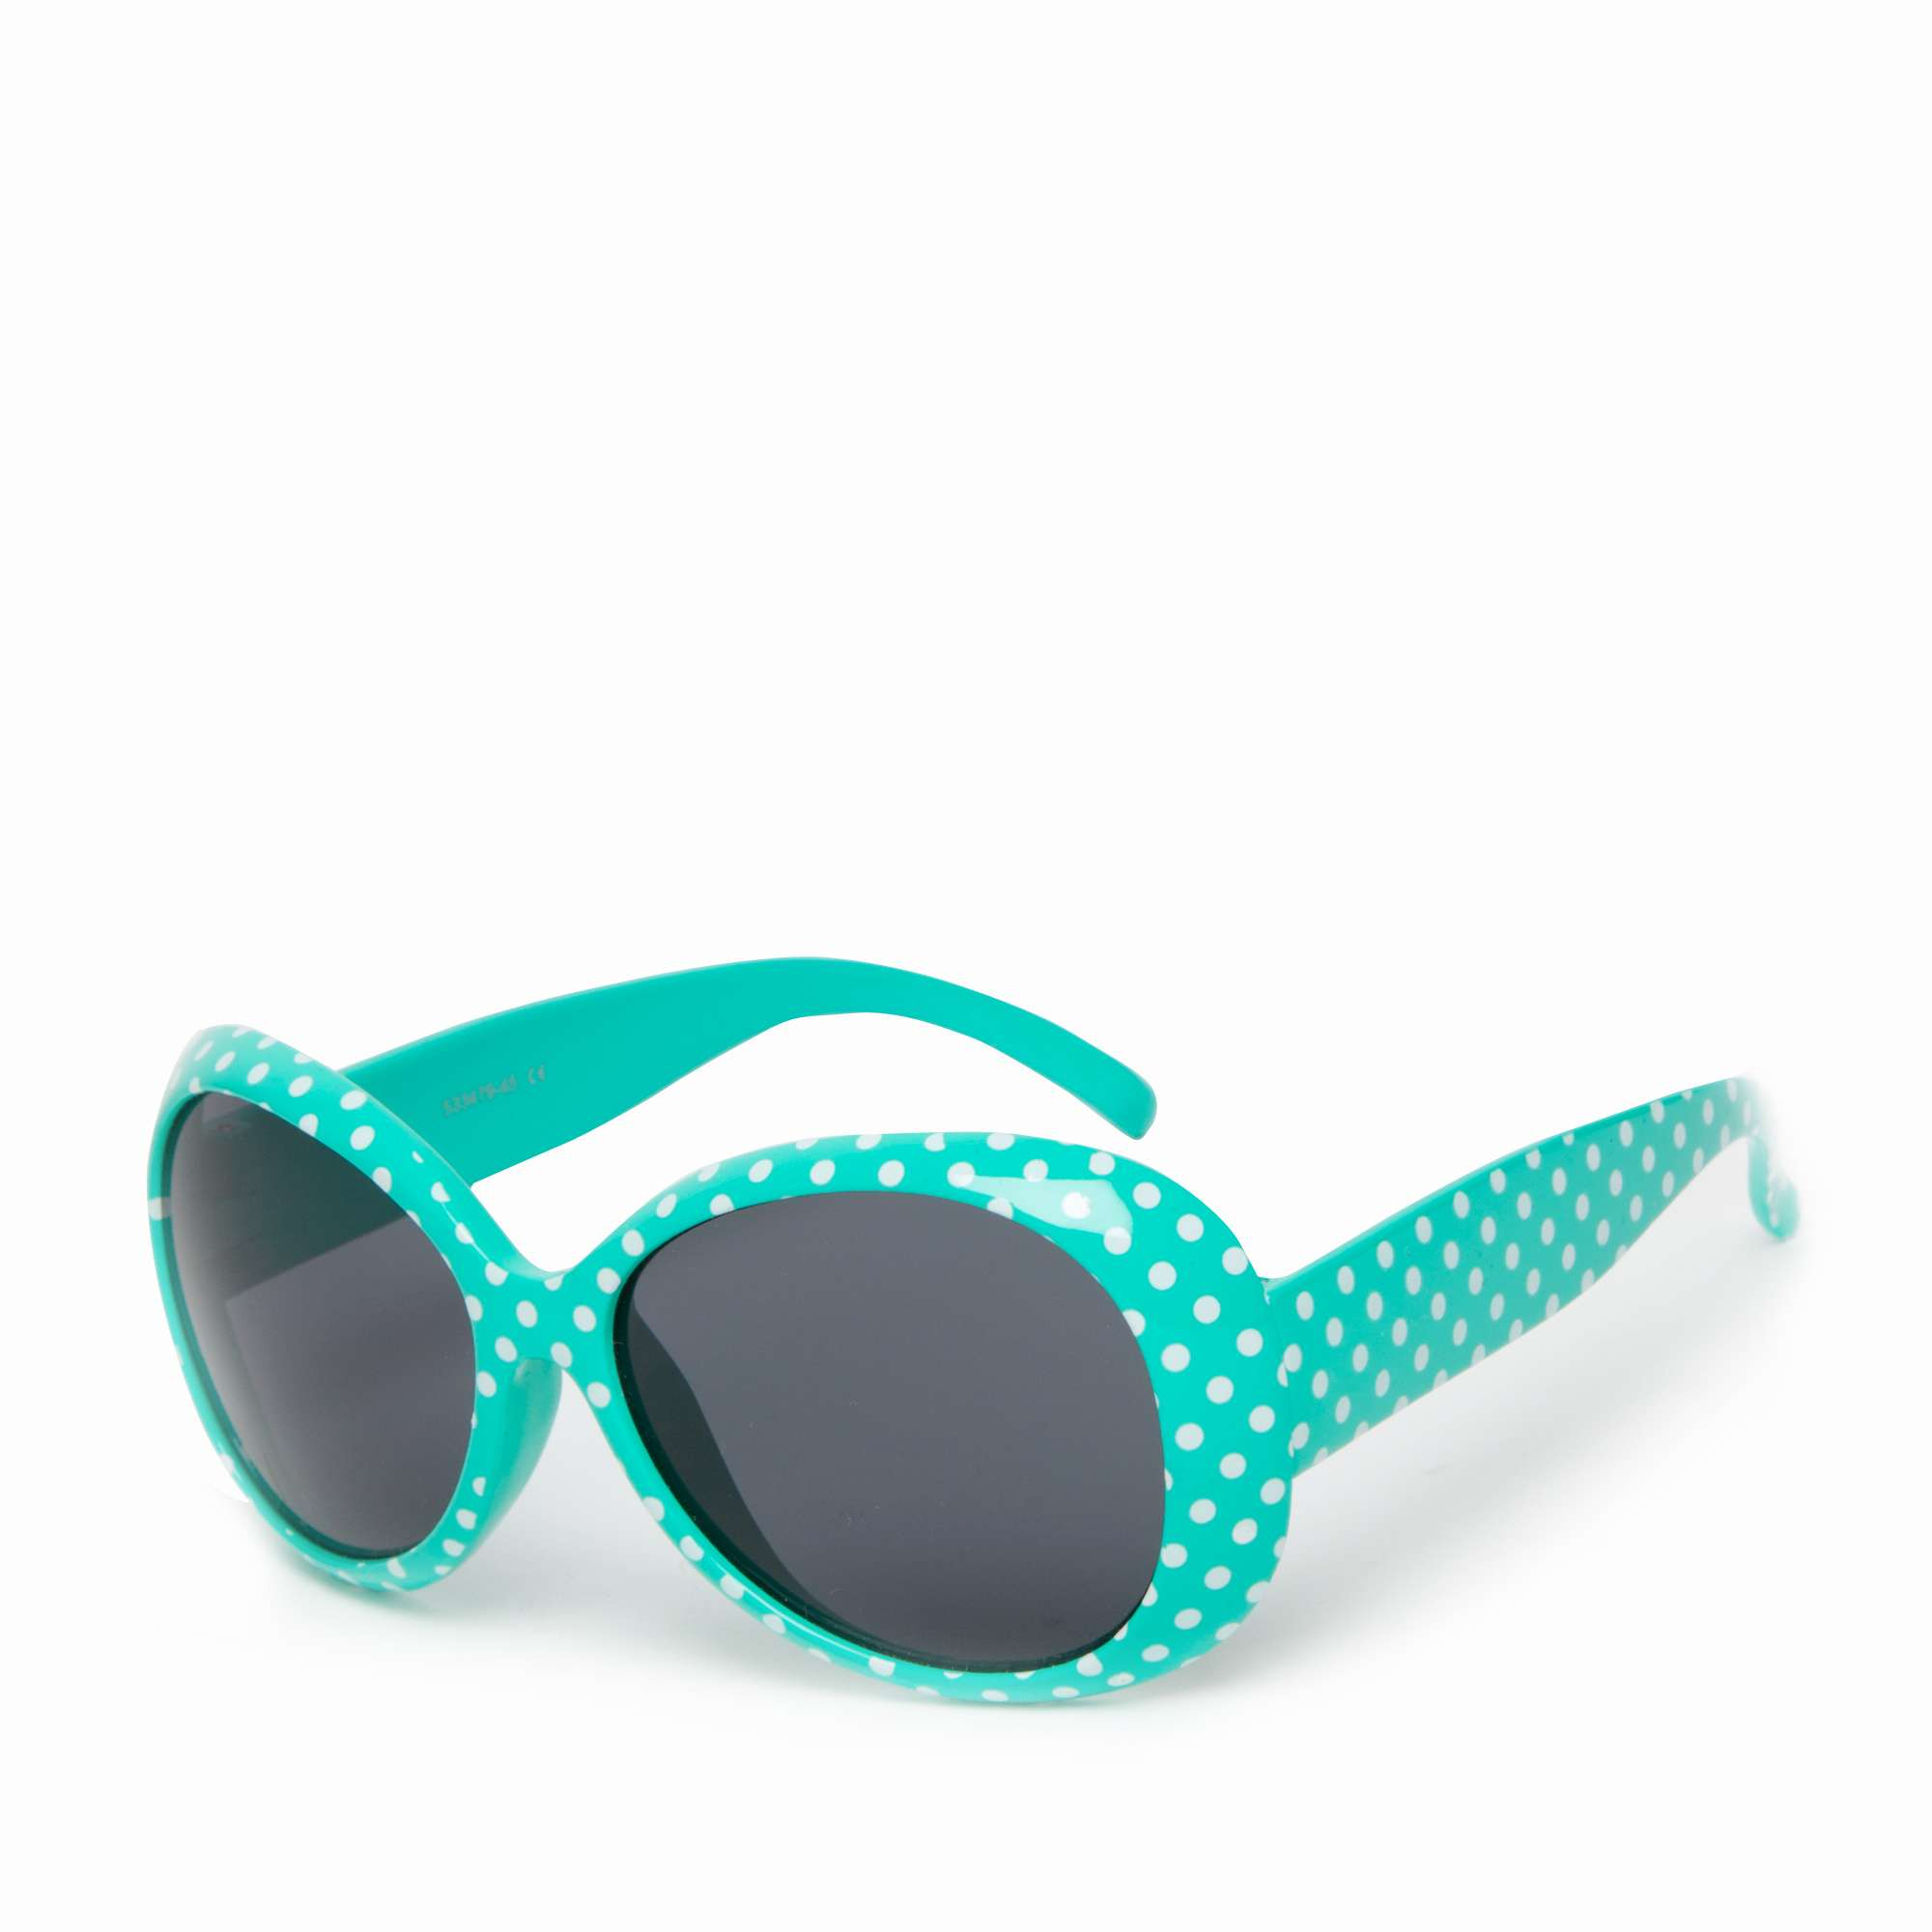 PETER STORM Girls' FF Glam Round Sunglasses